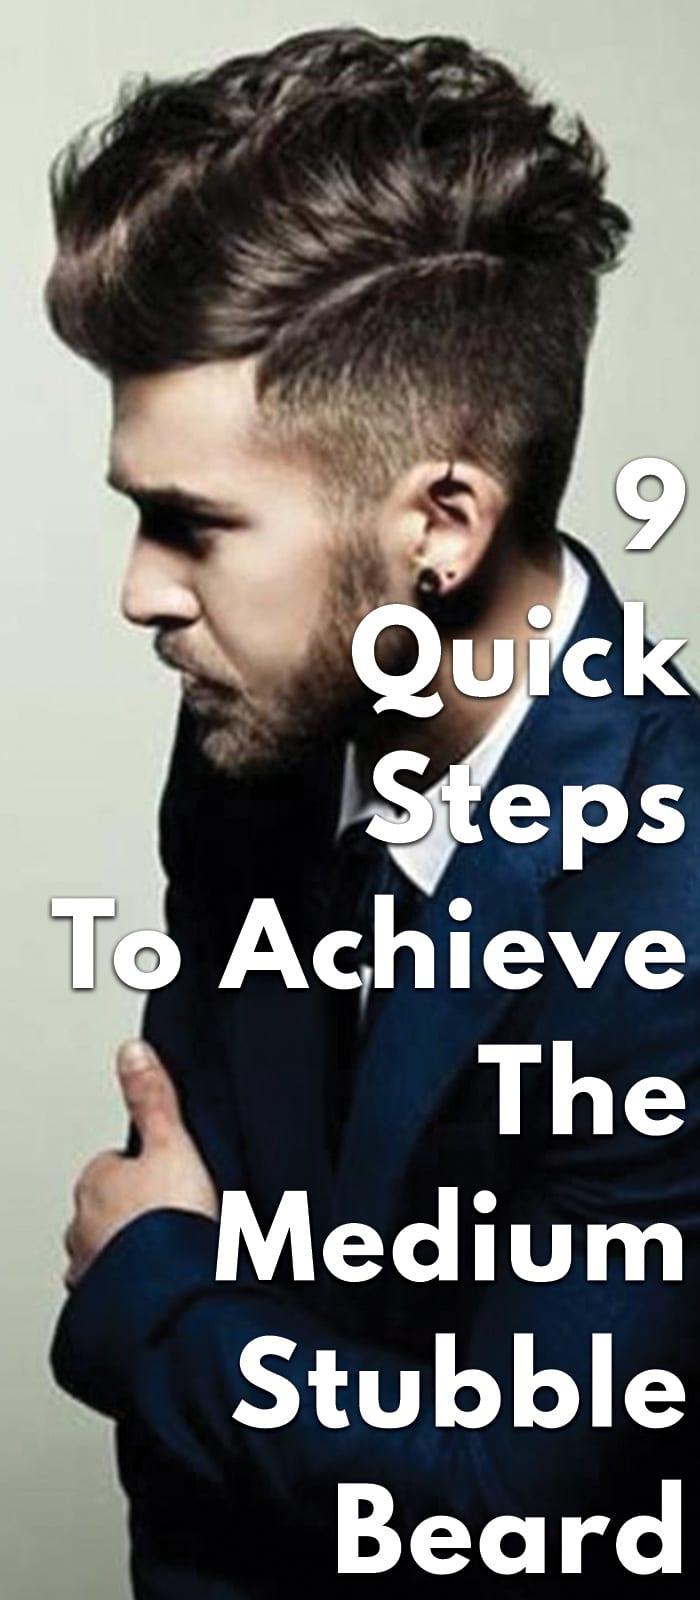 9-Quick-Steps-To-Achieve-The-Medium-Stubble-Beard